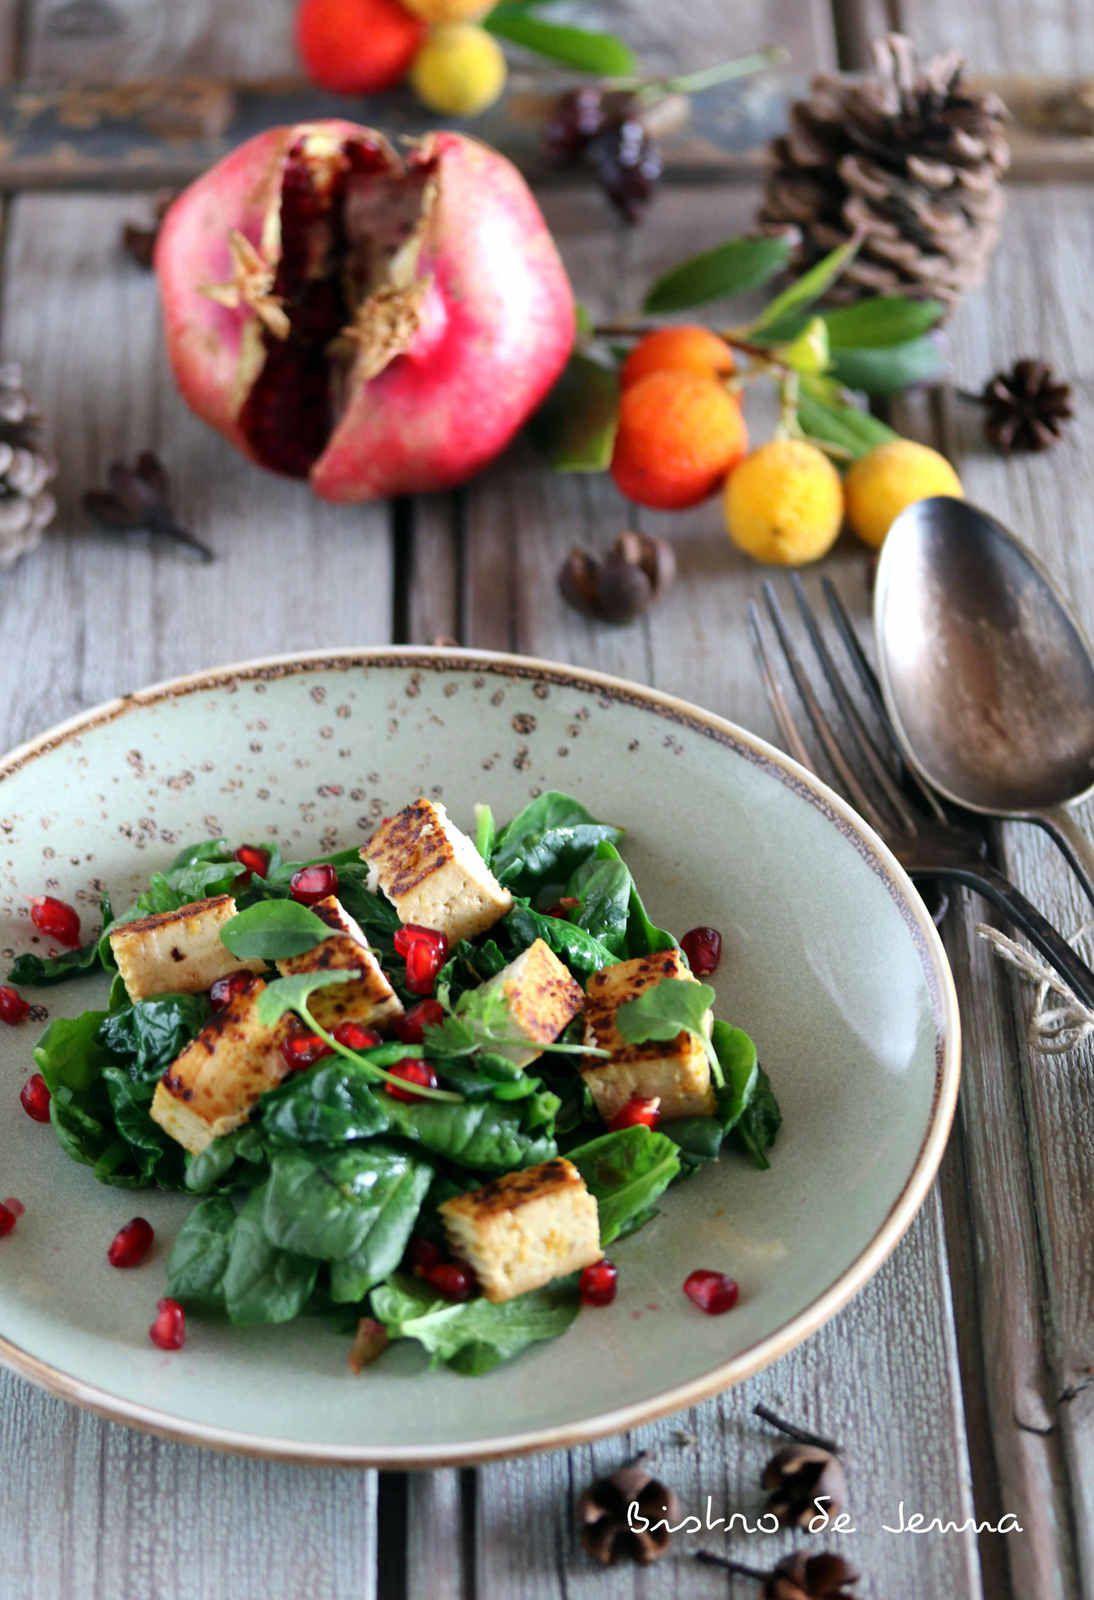 Salade végétalienne - épinard et tofu mariné